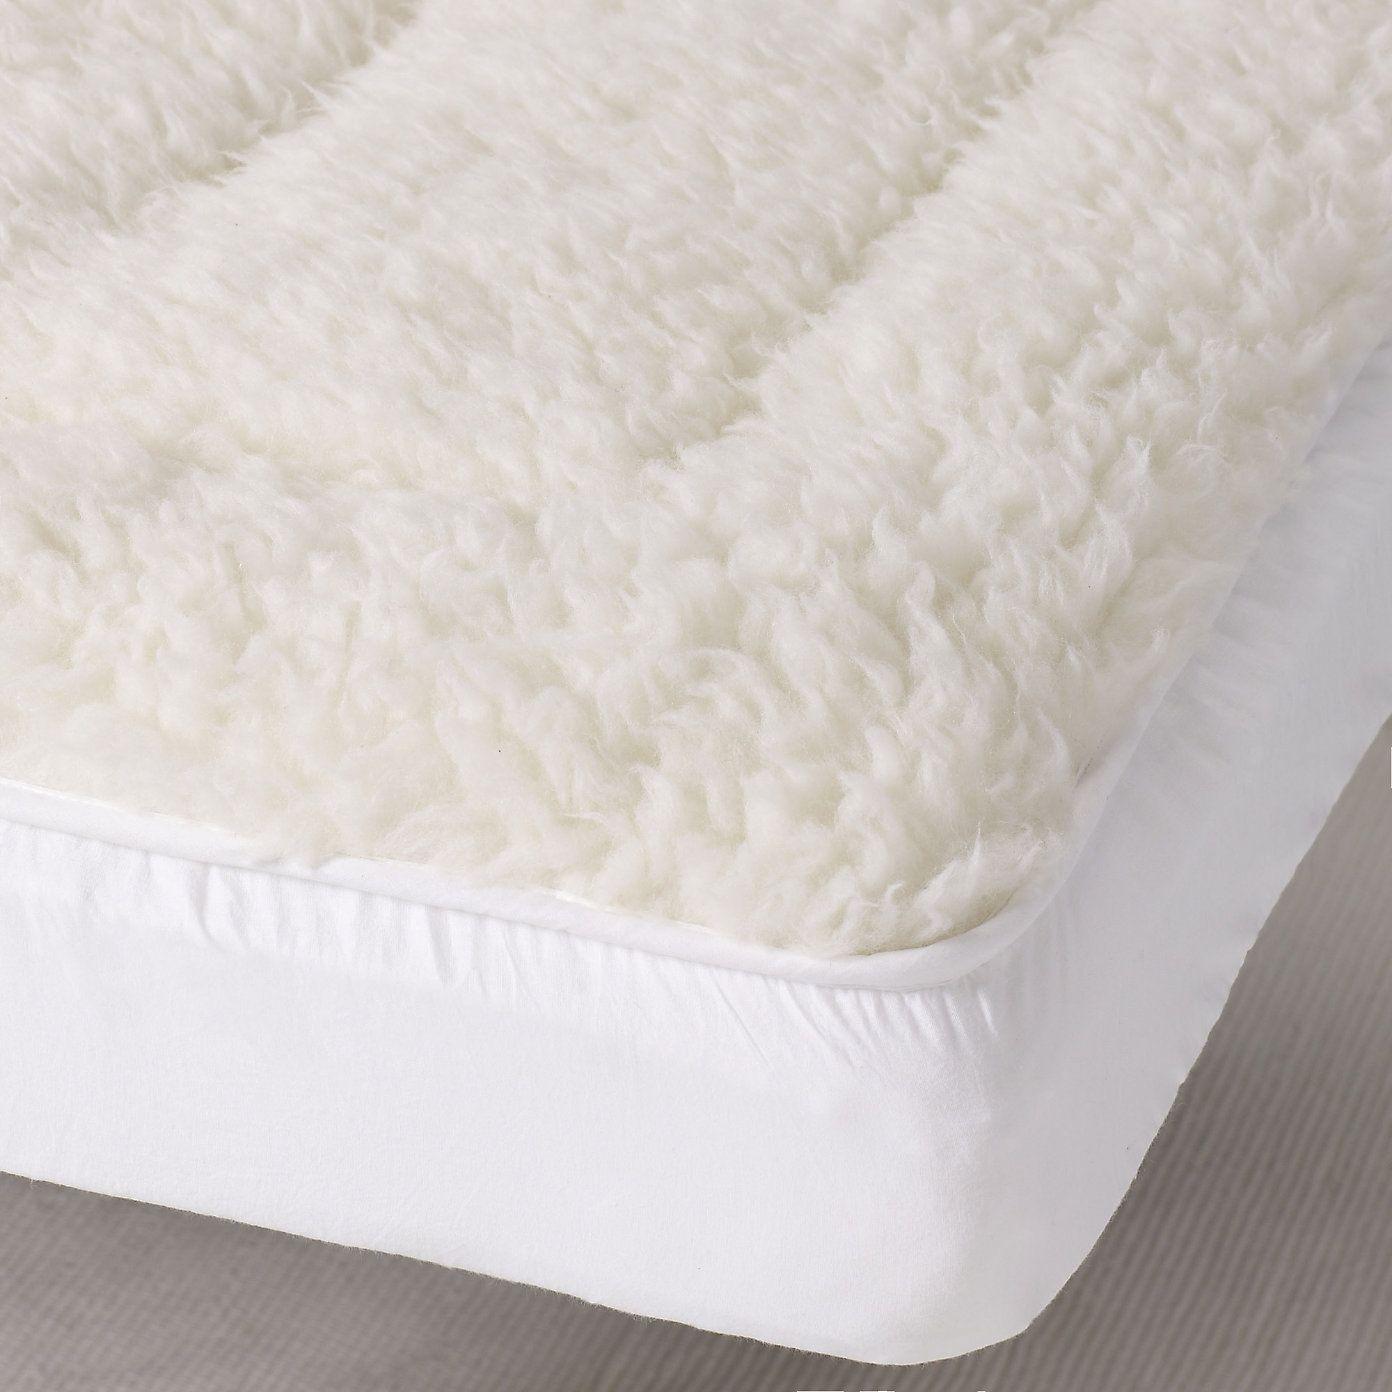 best service 975c7 8a4e1 Cot Bed Mattress Topper | The White Company | Albron Nursery ...